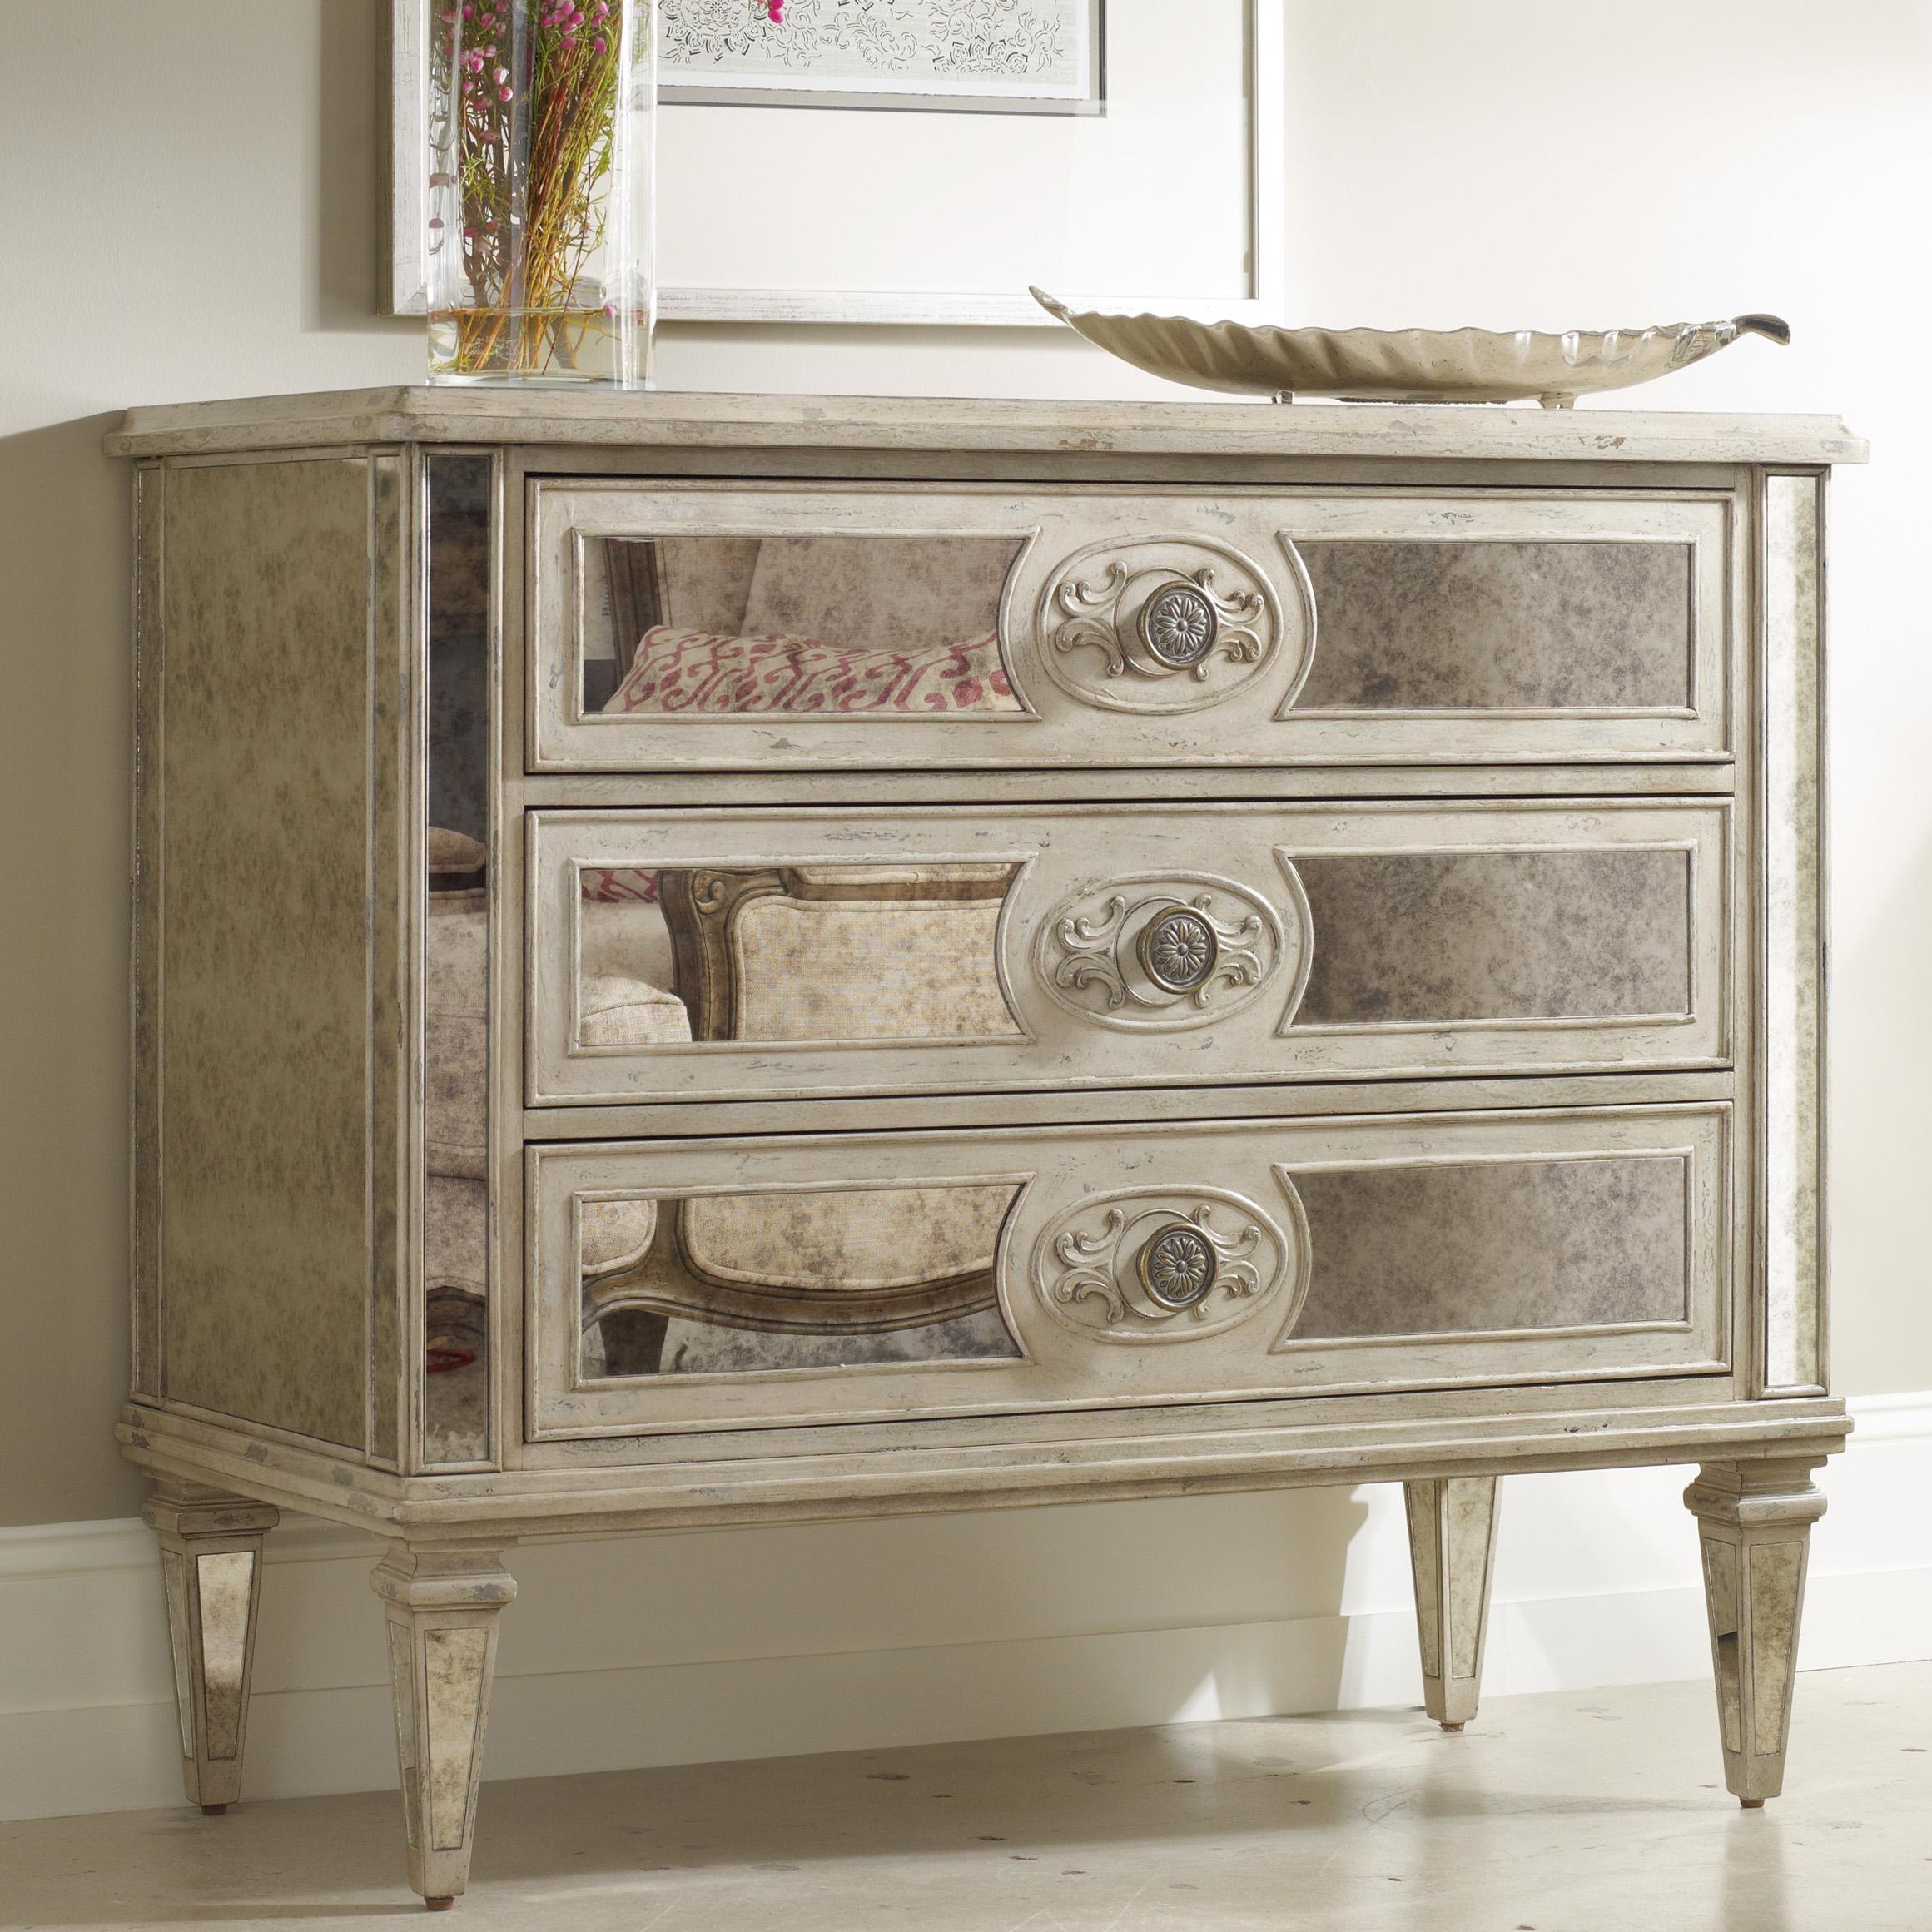 Living Room Furniture Hamilton Ontario hooker furniture living room accents 3-drawer antique mirrored